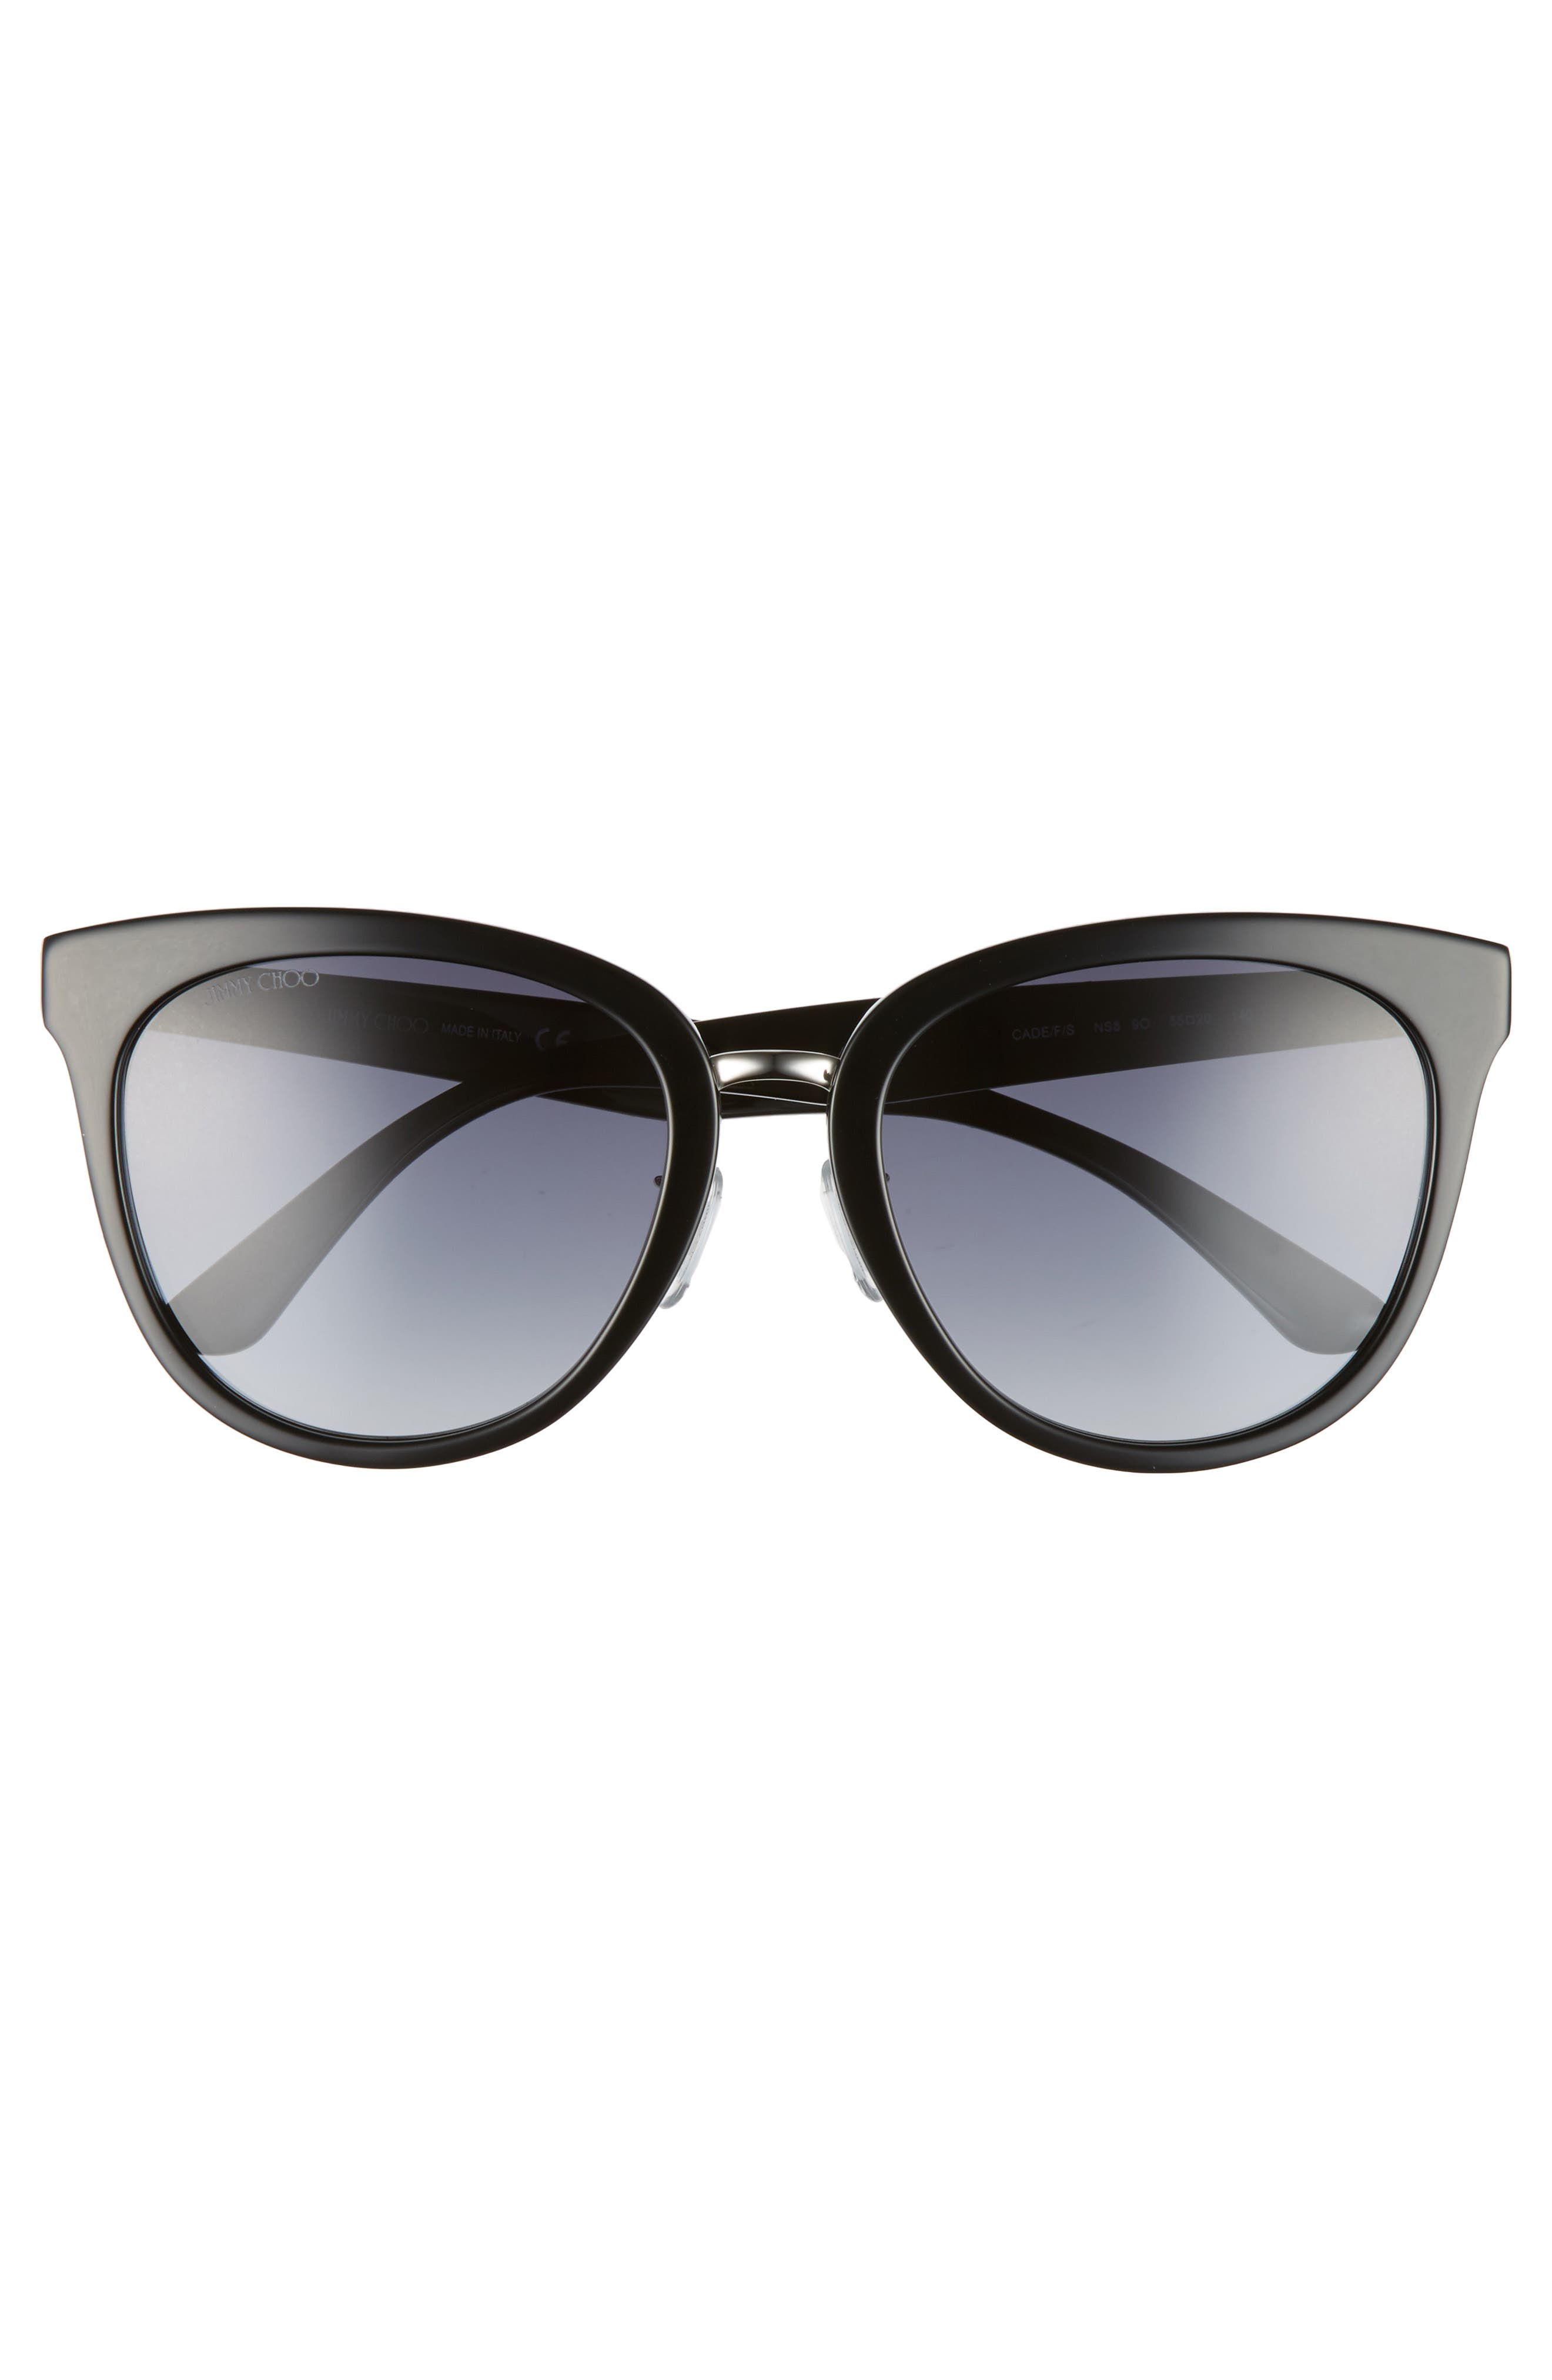 Cadefs 55mm Sunglasses,                             Alternate thumbnail 3, color,                             001